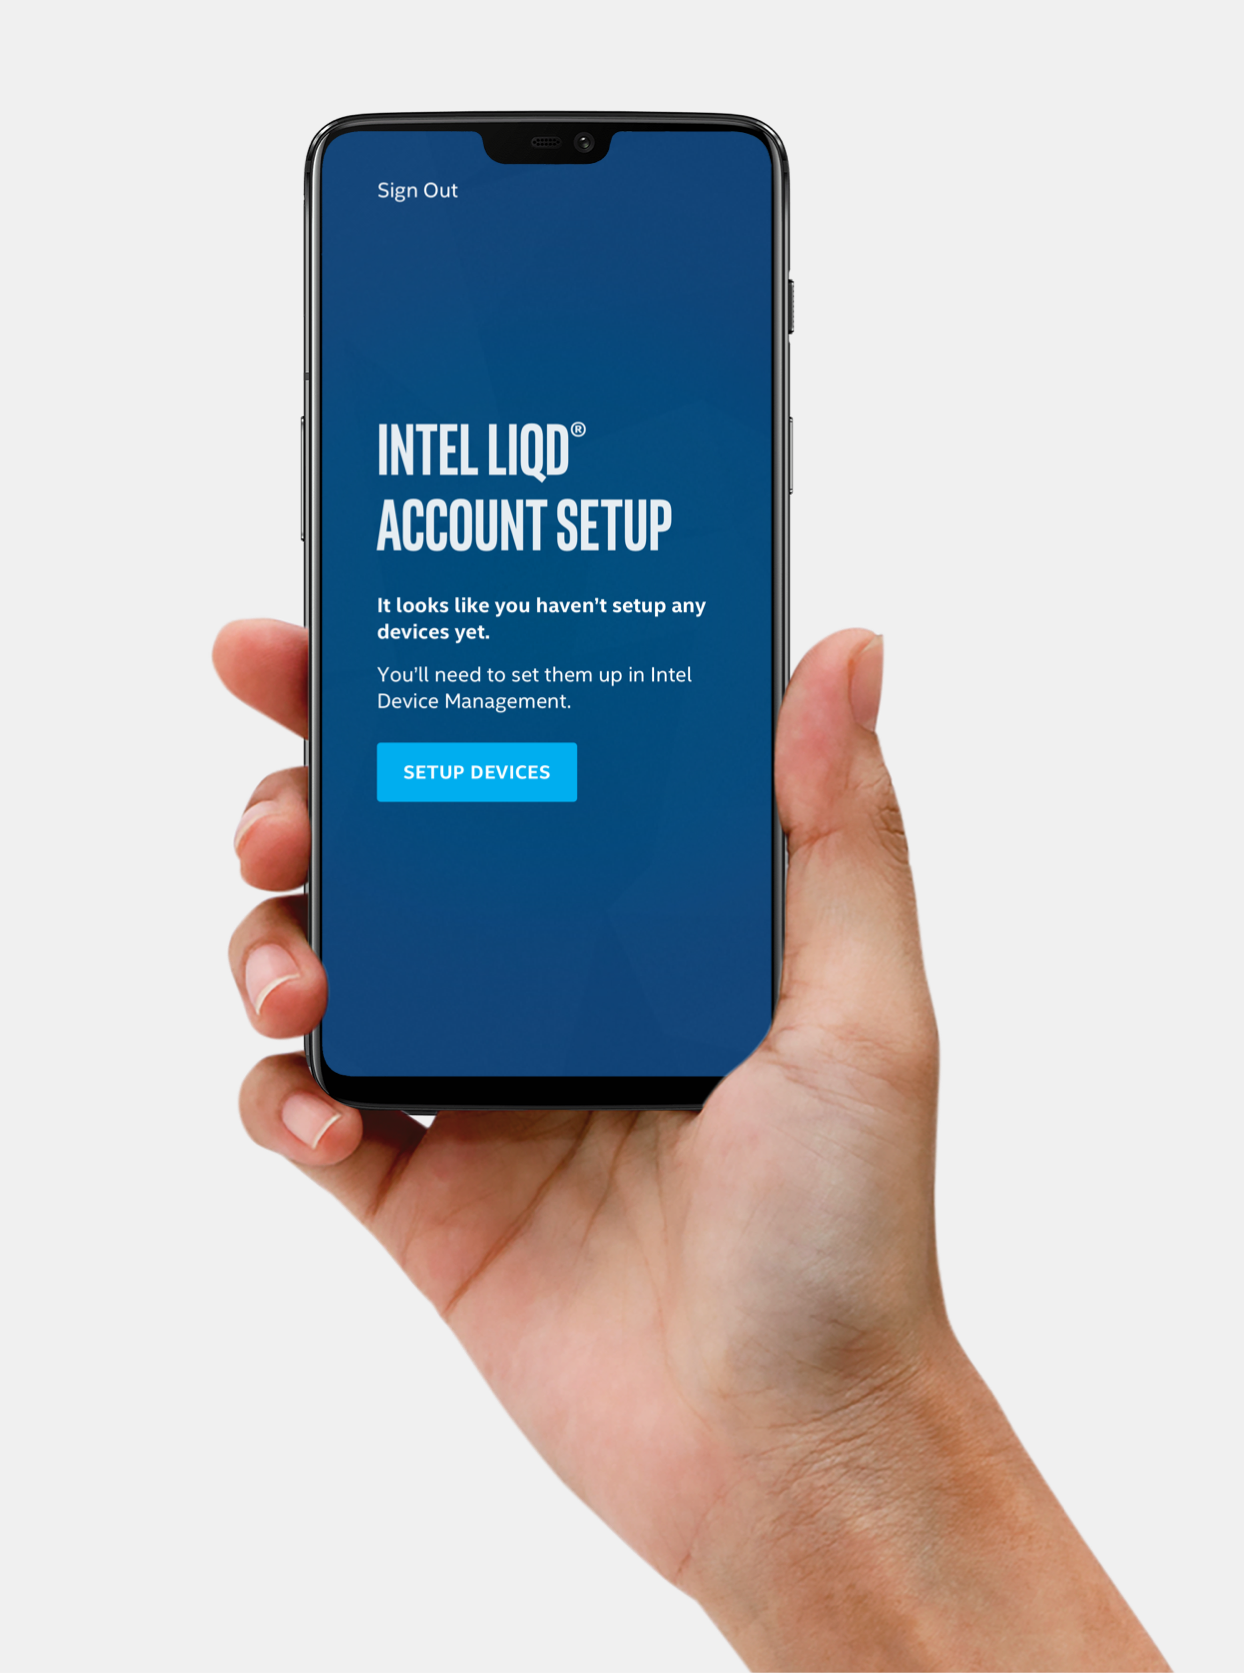 Intel-4@2x.png